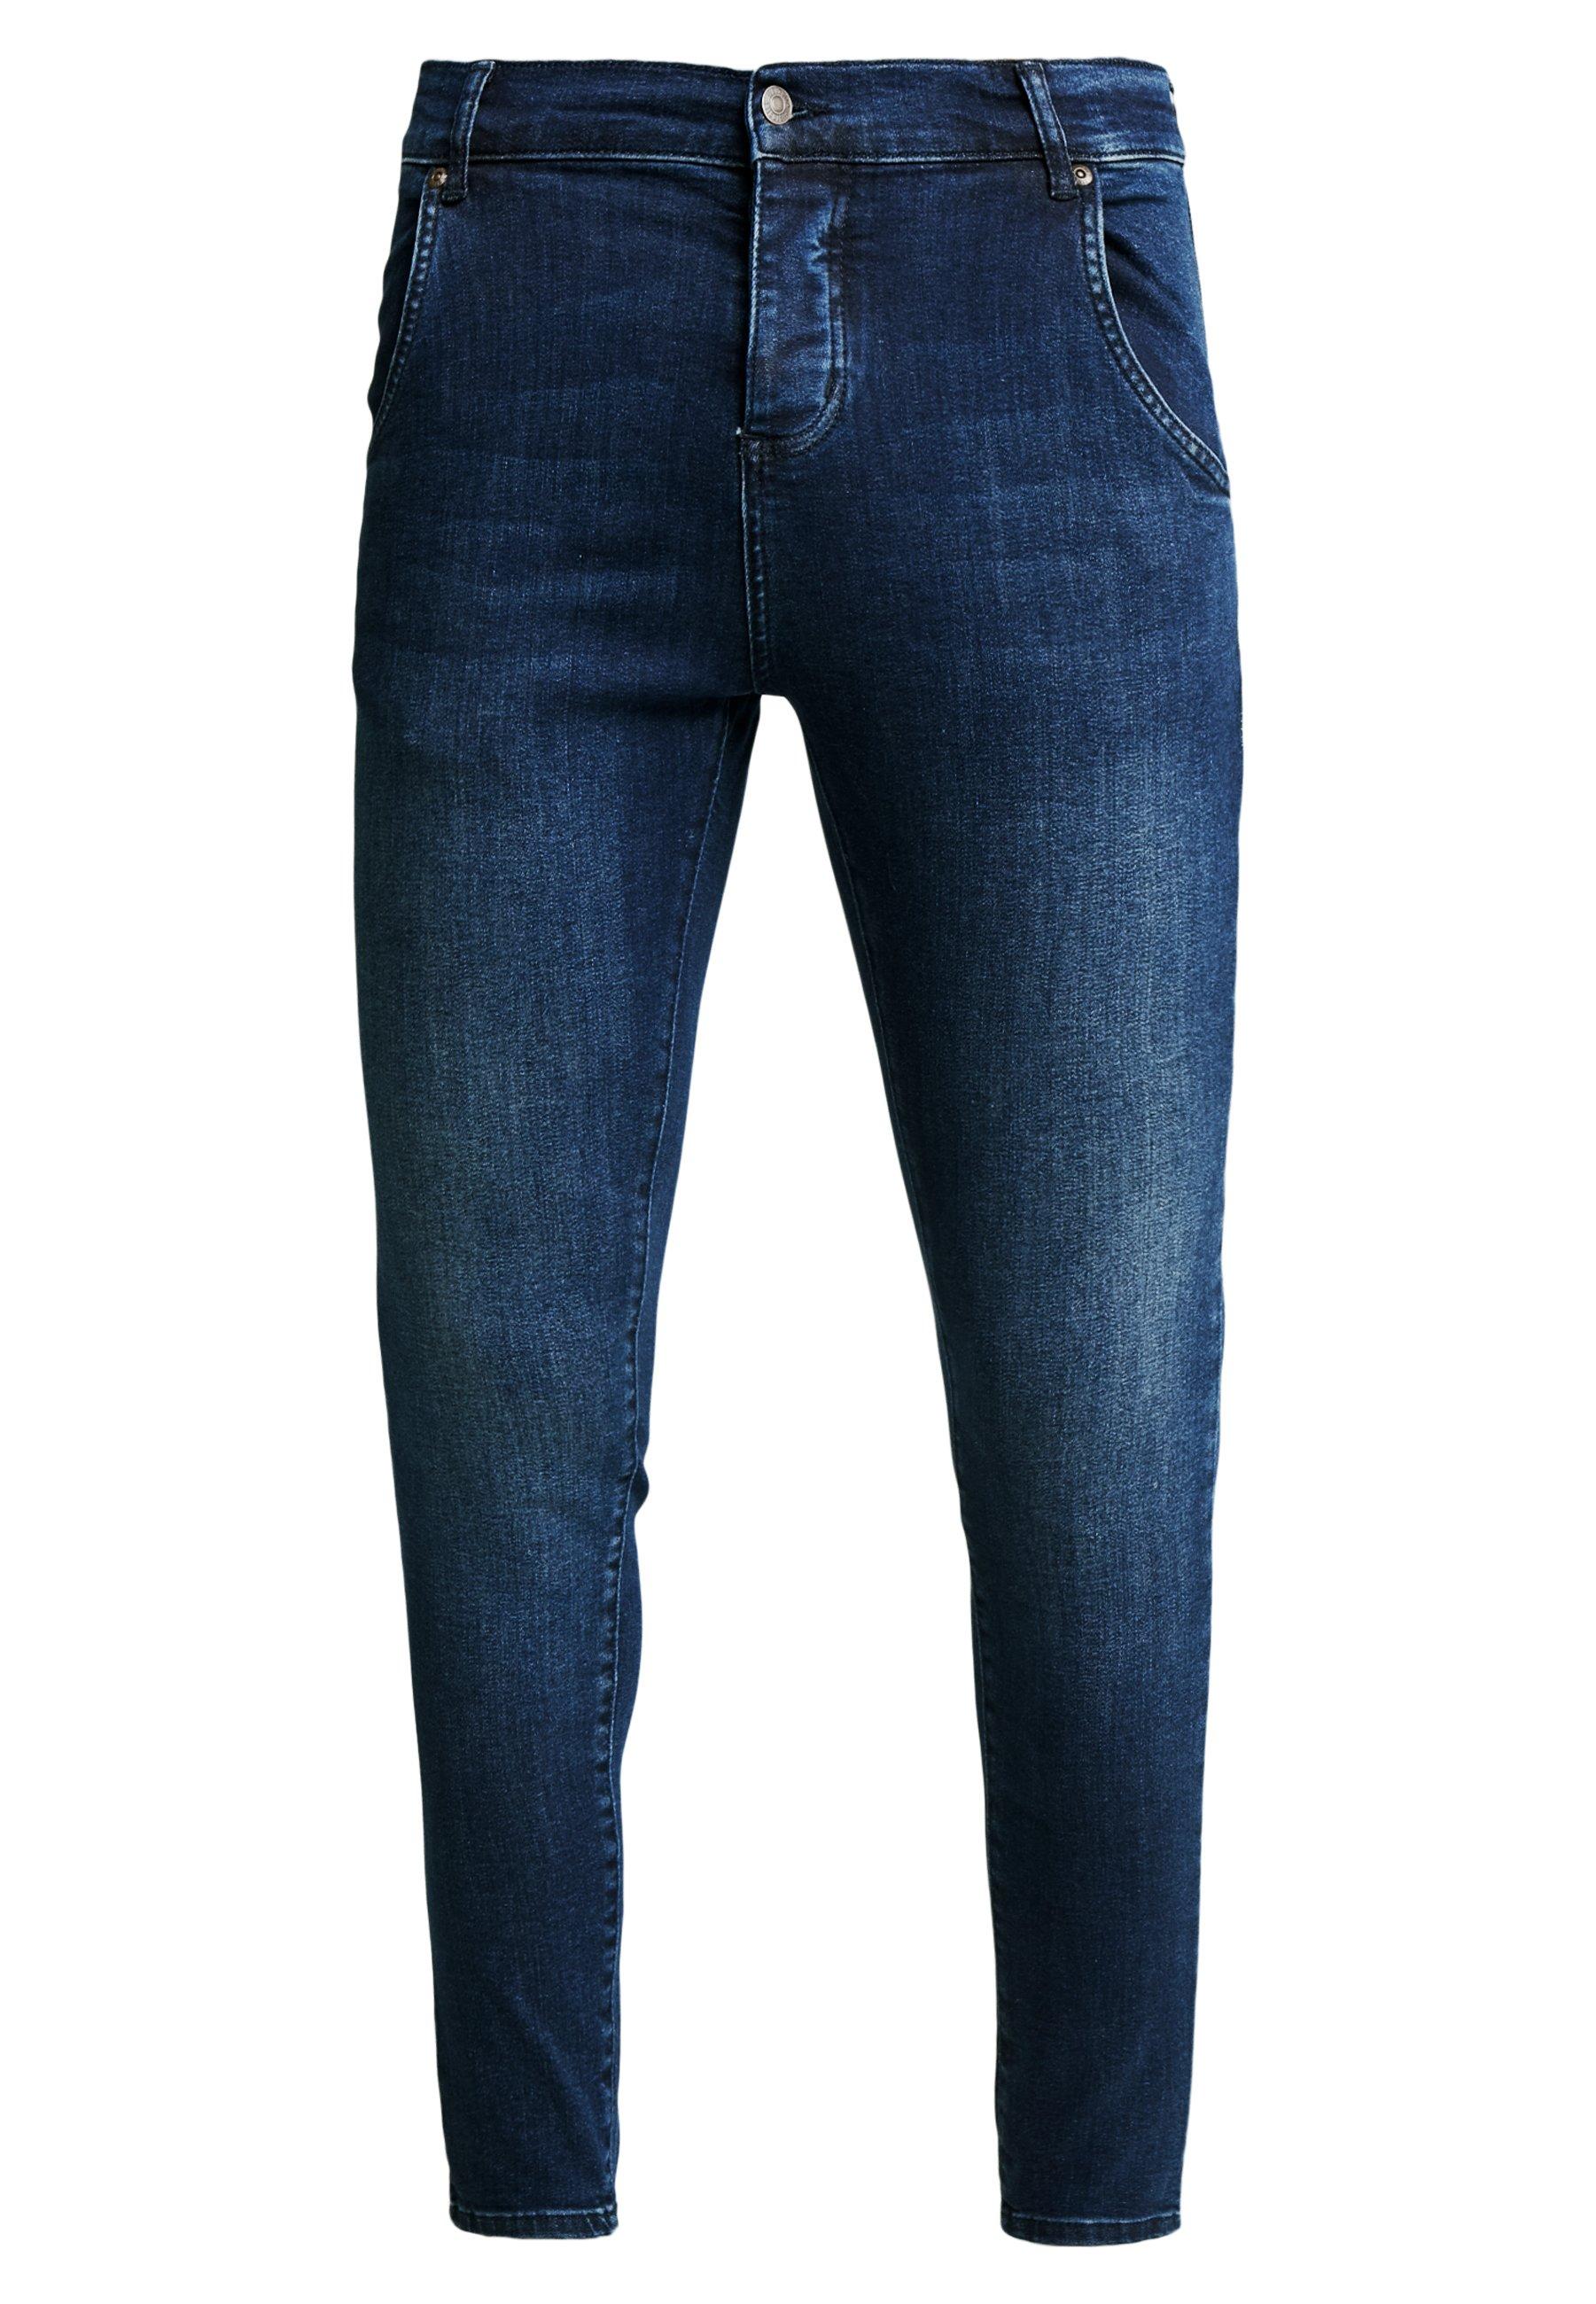 Siksilk Skinny - Jeans Tapered Fit Indigo/mørkeblå